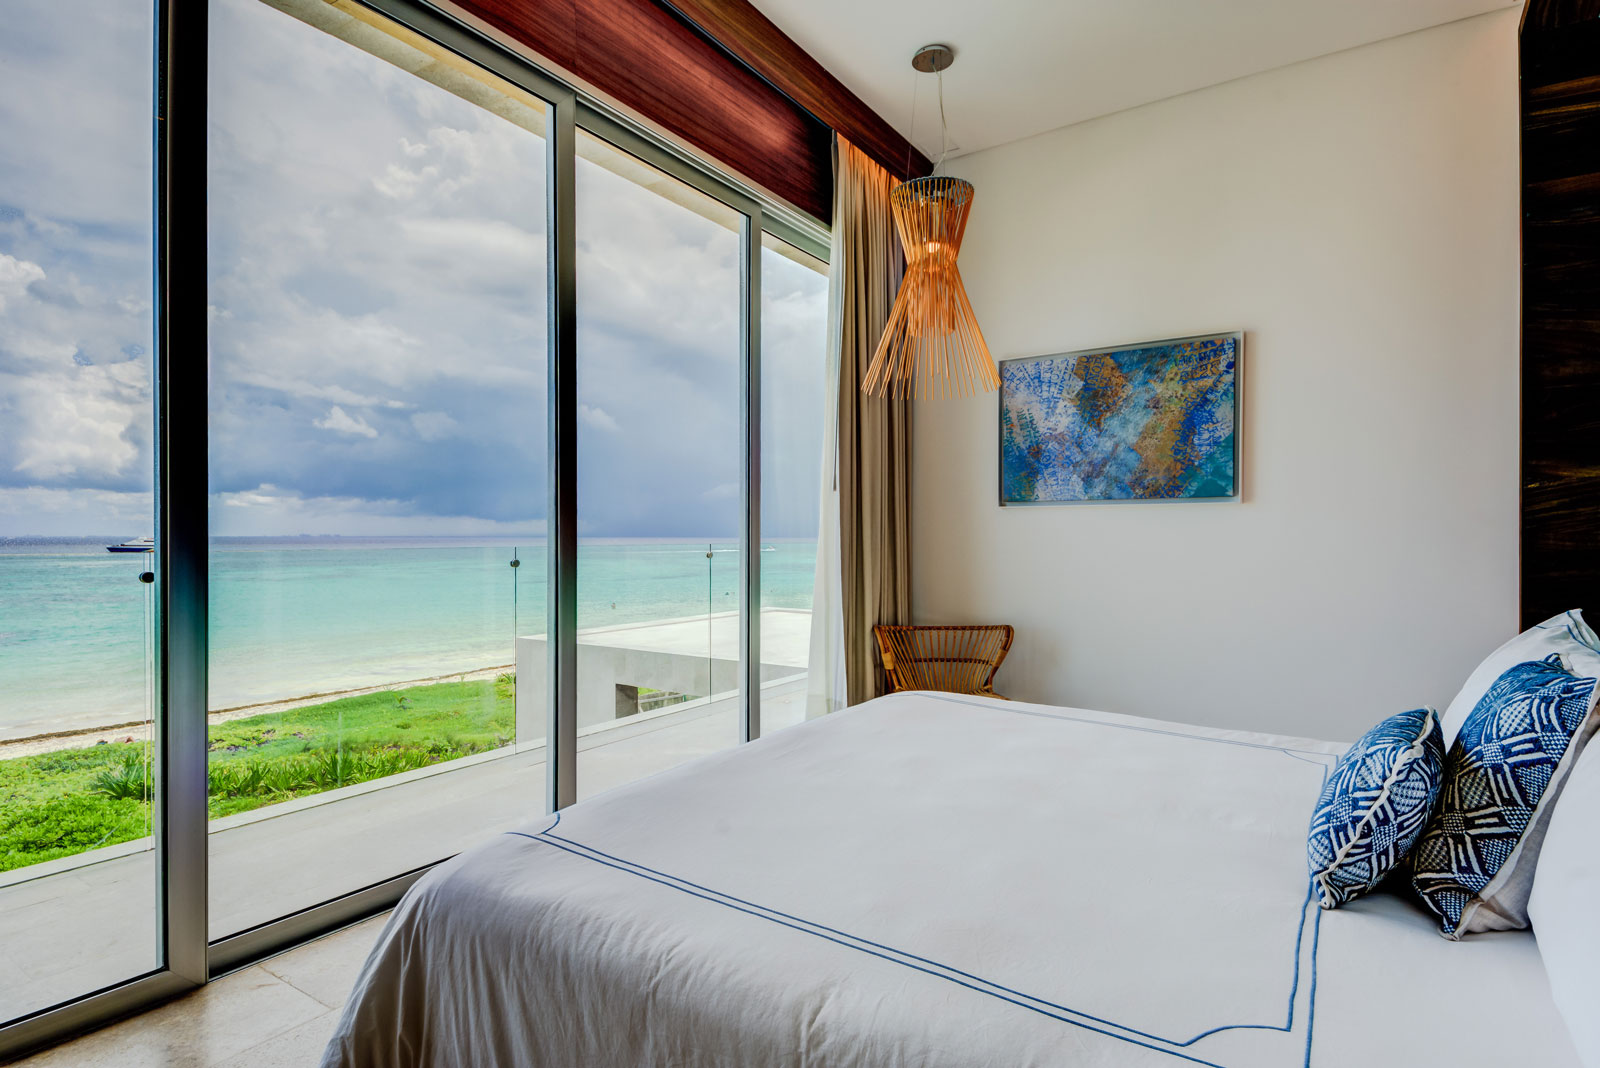 Maya_Luxe_Riviera_Maya_Luxury_Villas_Experiences_Playa_del_Carmen_Playacar_7_Bedrooms_Villa_Kin_Ich_25.jpg